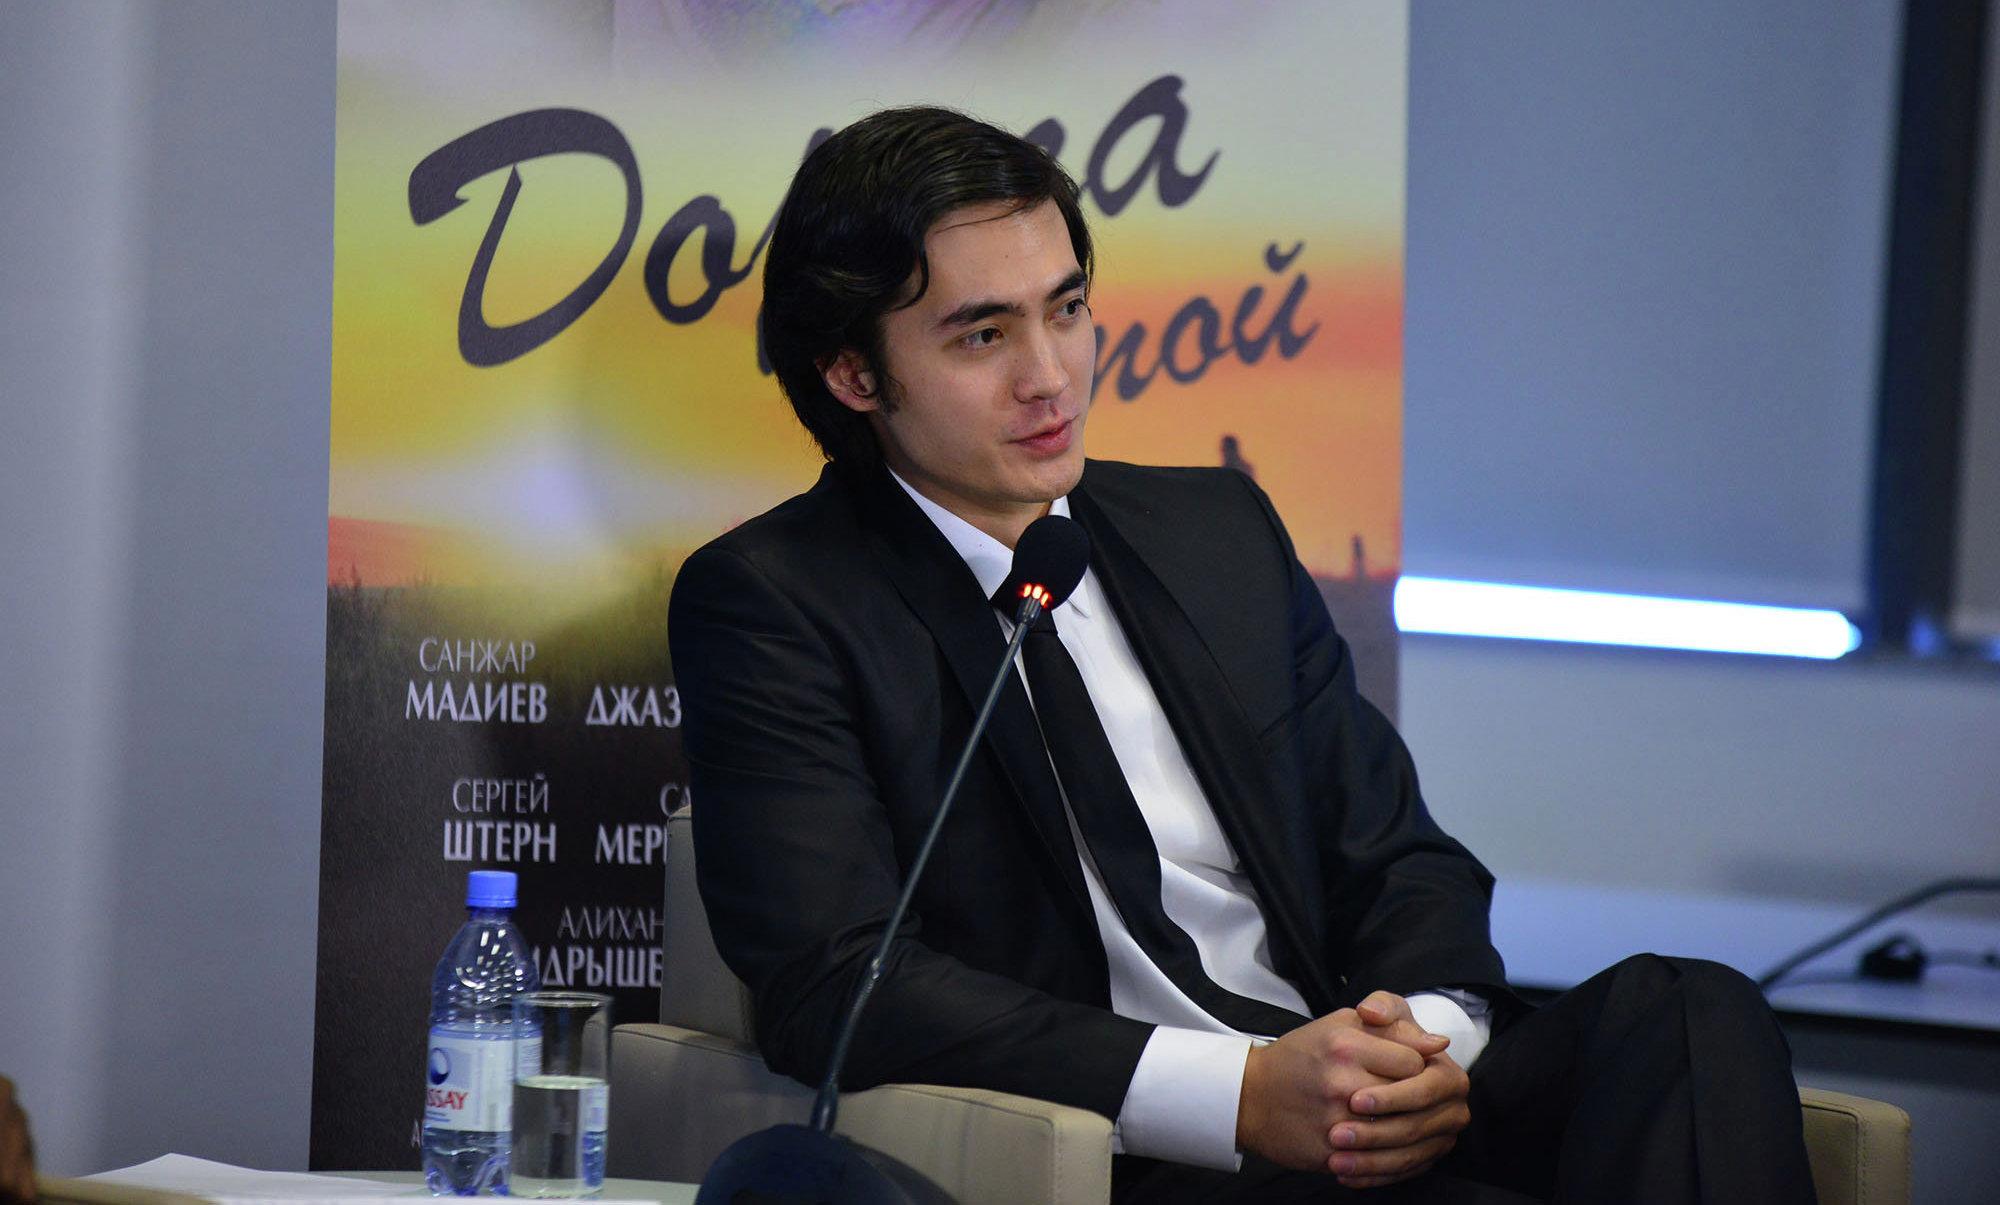 Актер Санжар Мәдиев